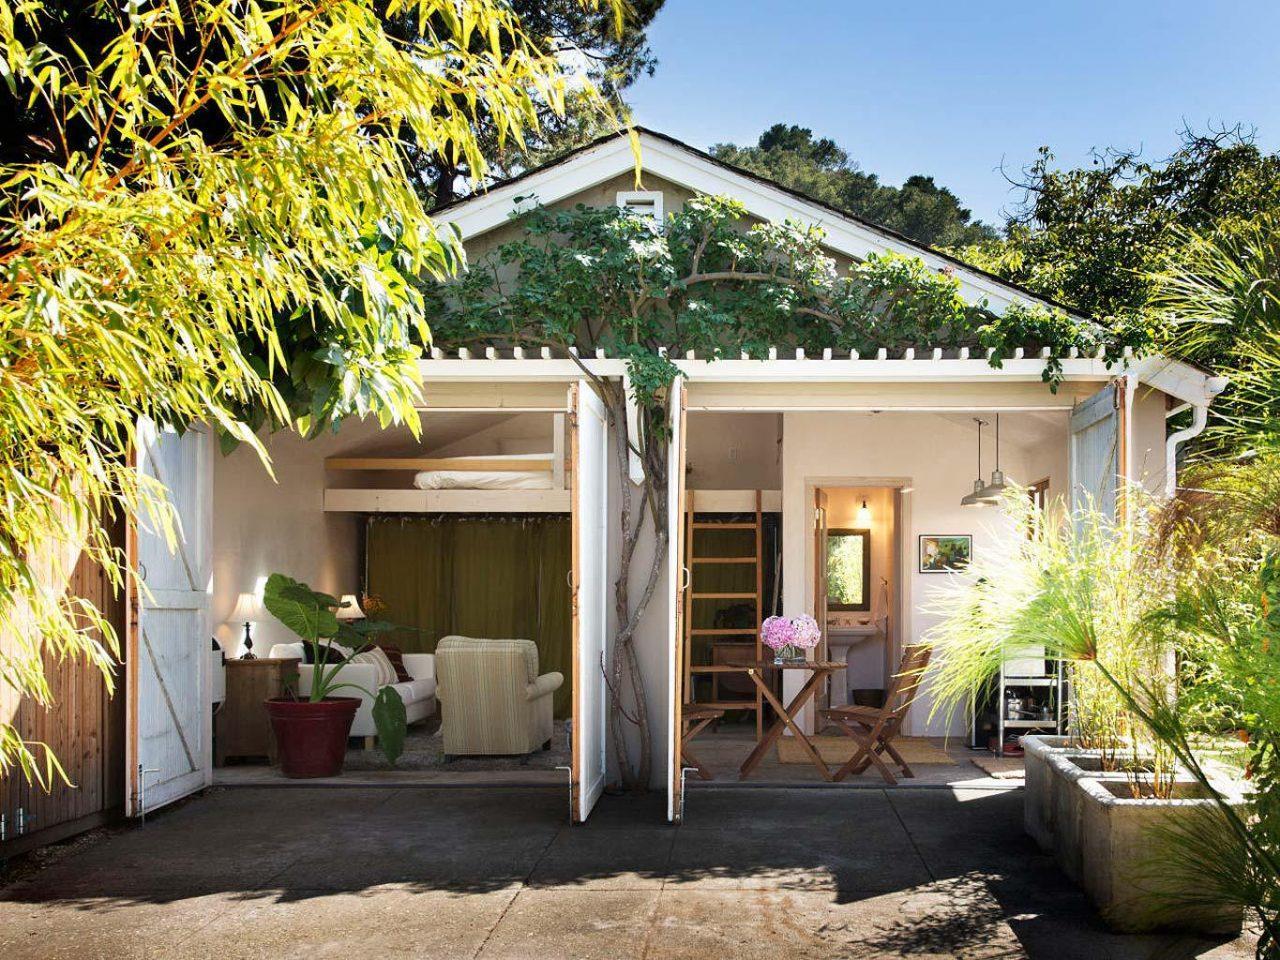 Trasformare Un Garage In Abitazione da garage a casa per gli ospiti - mansarda.it